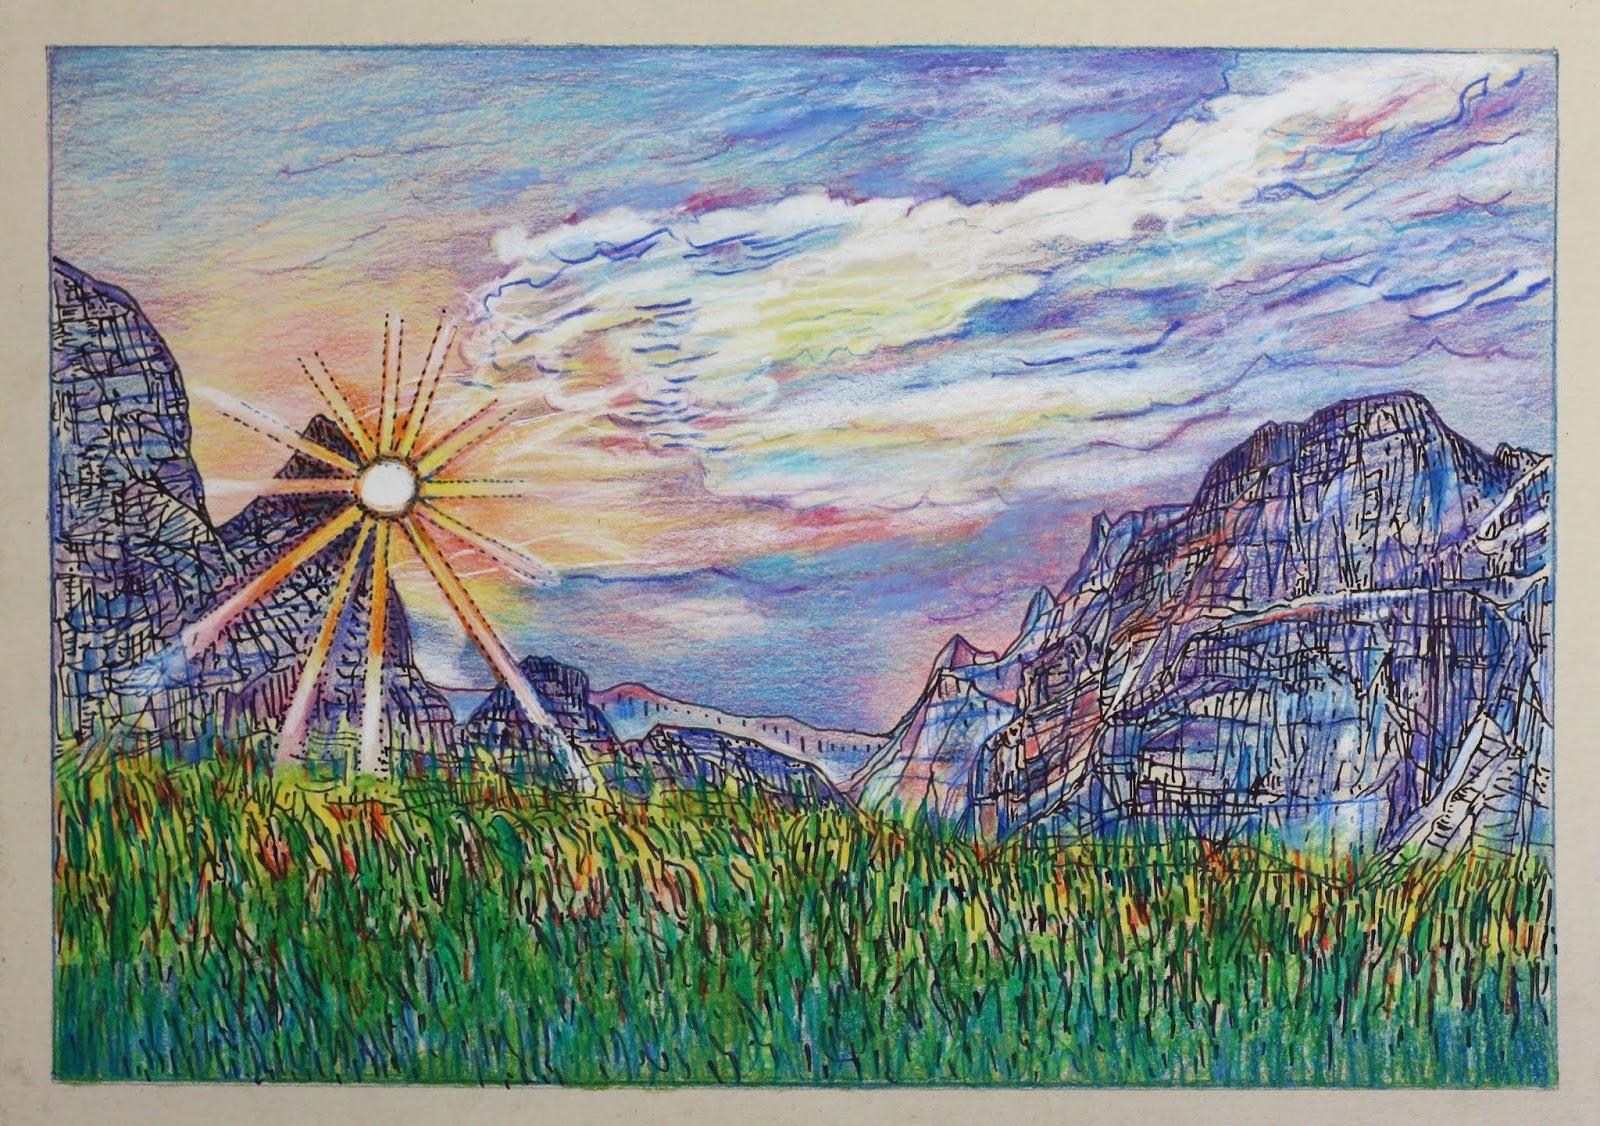 Clementine Feuillet Dessin Paysage Drawing Landscape 2018